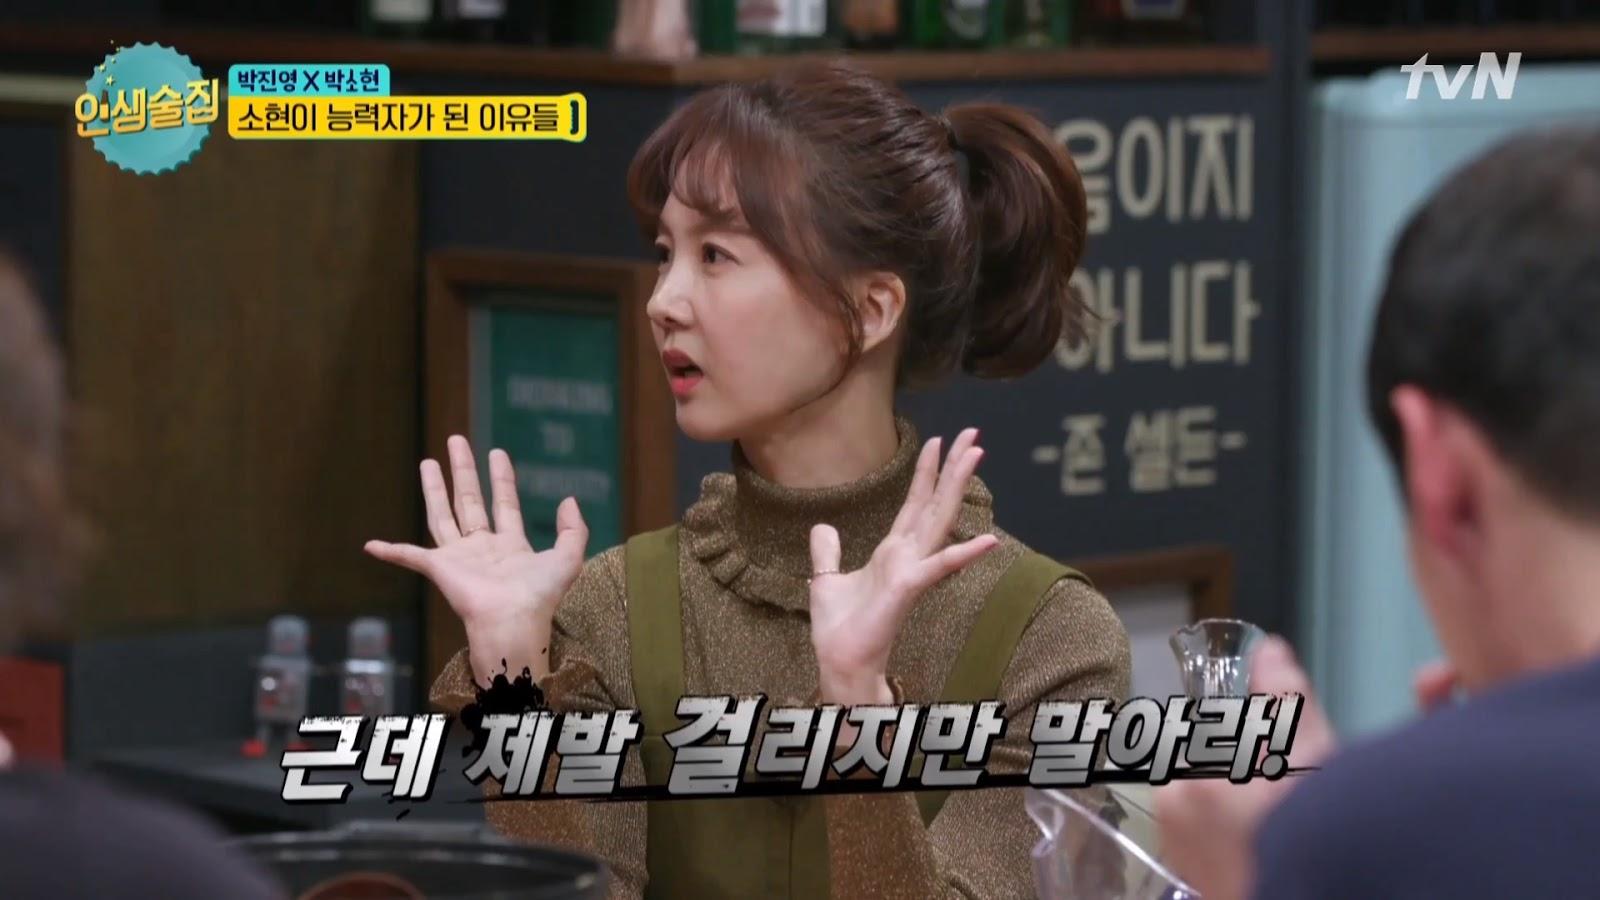 Kpop idols dating non celebrities